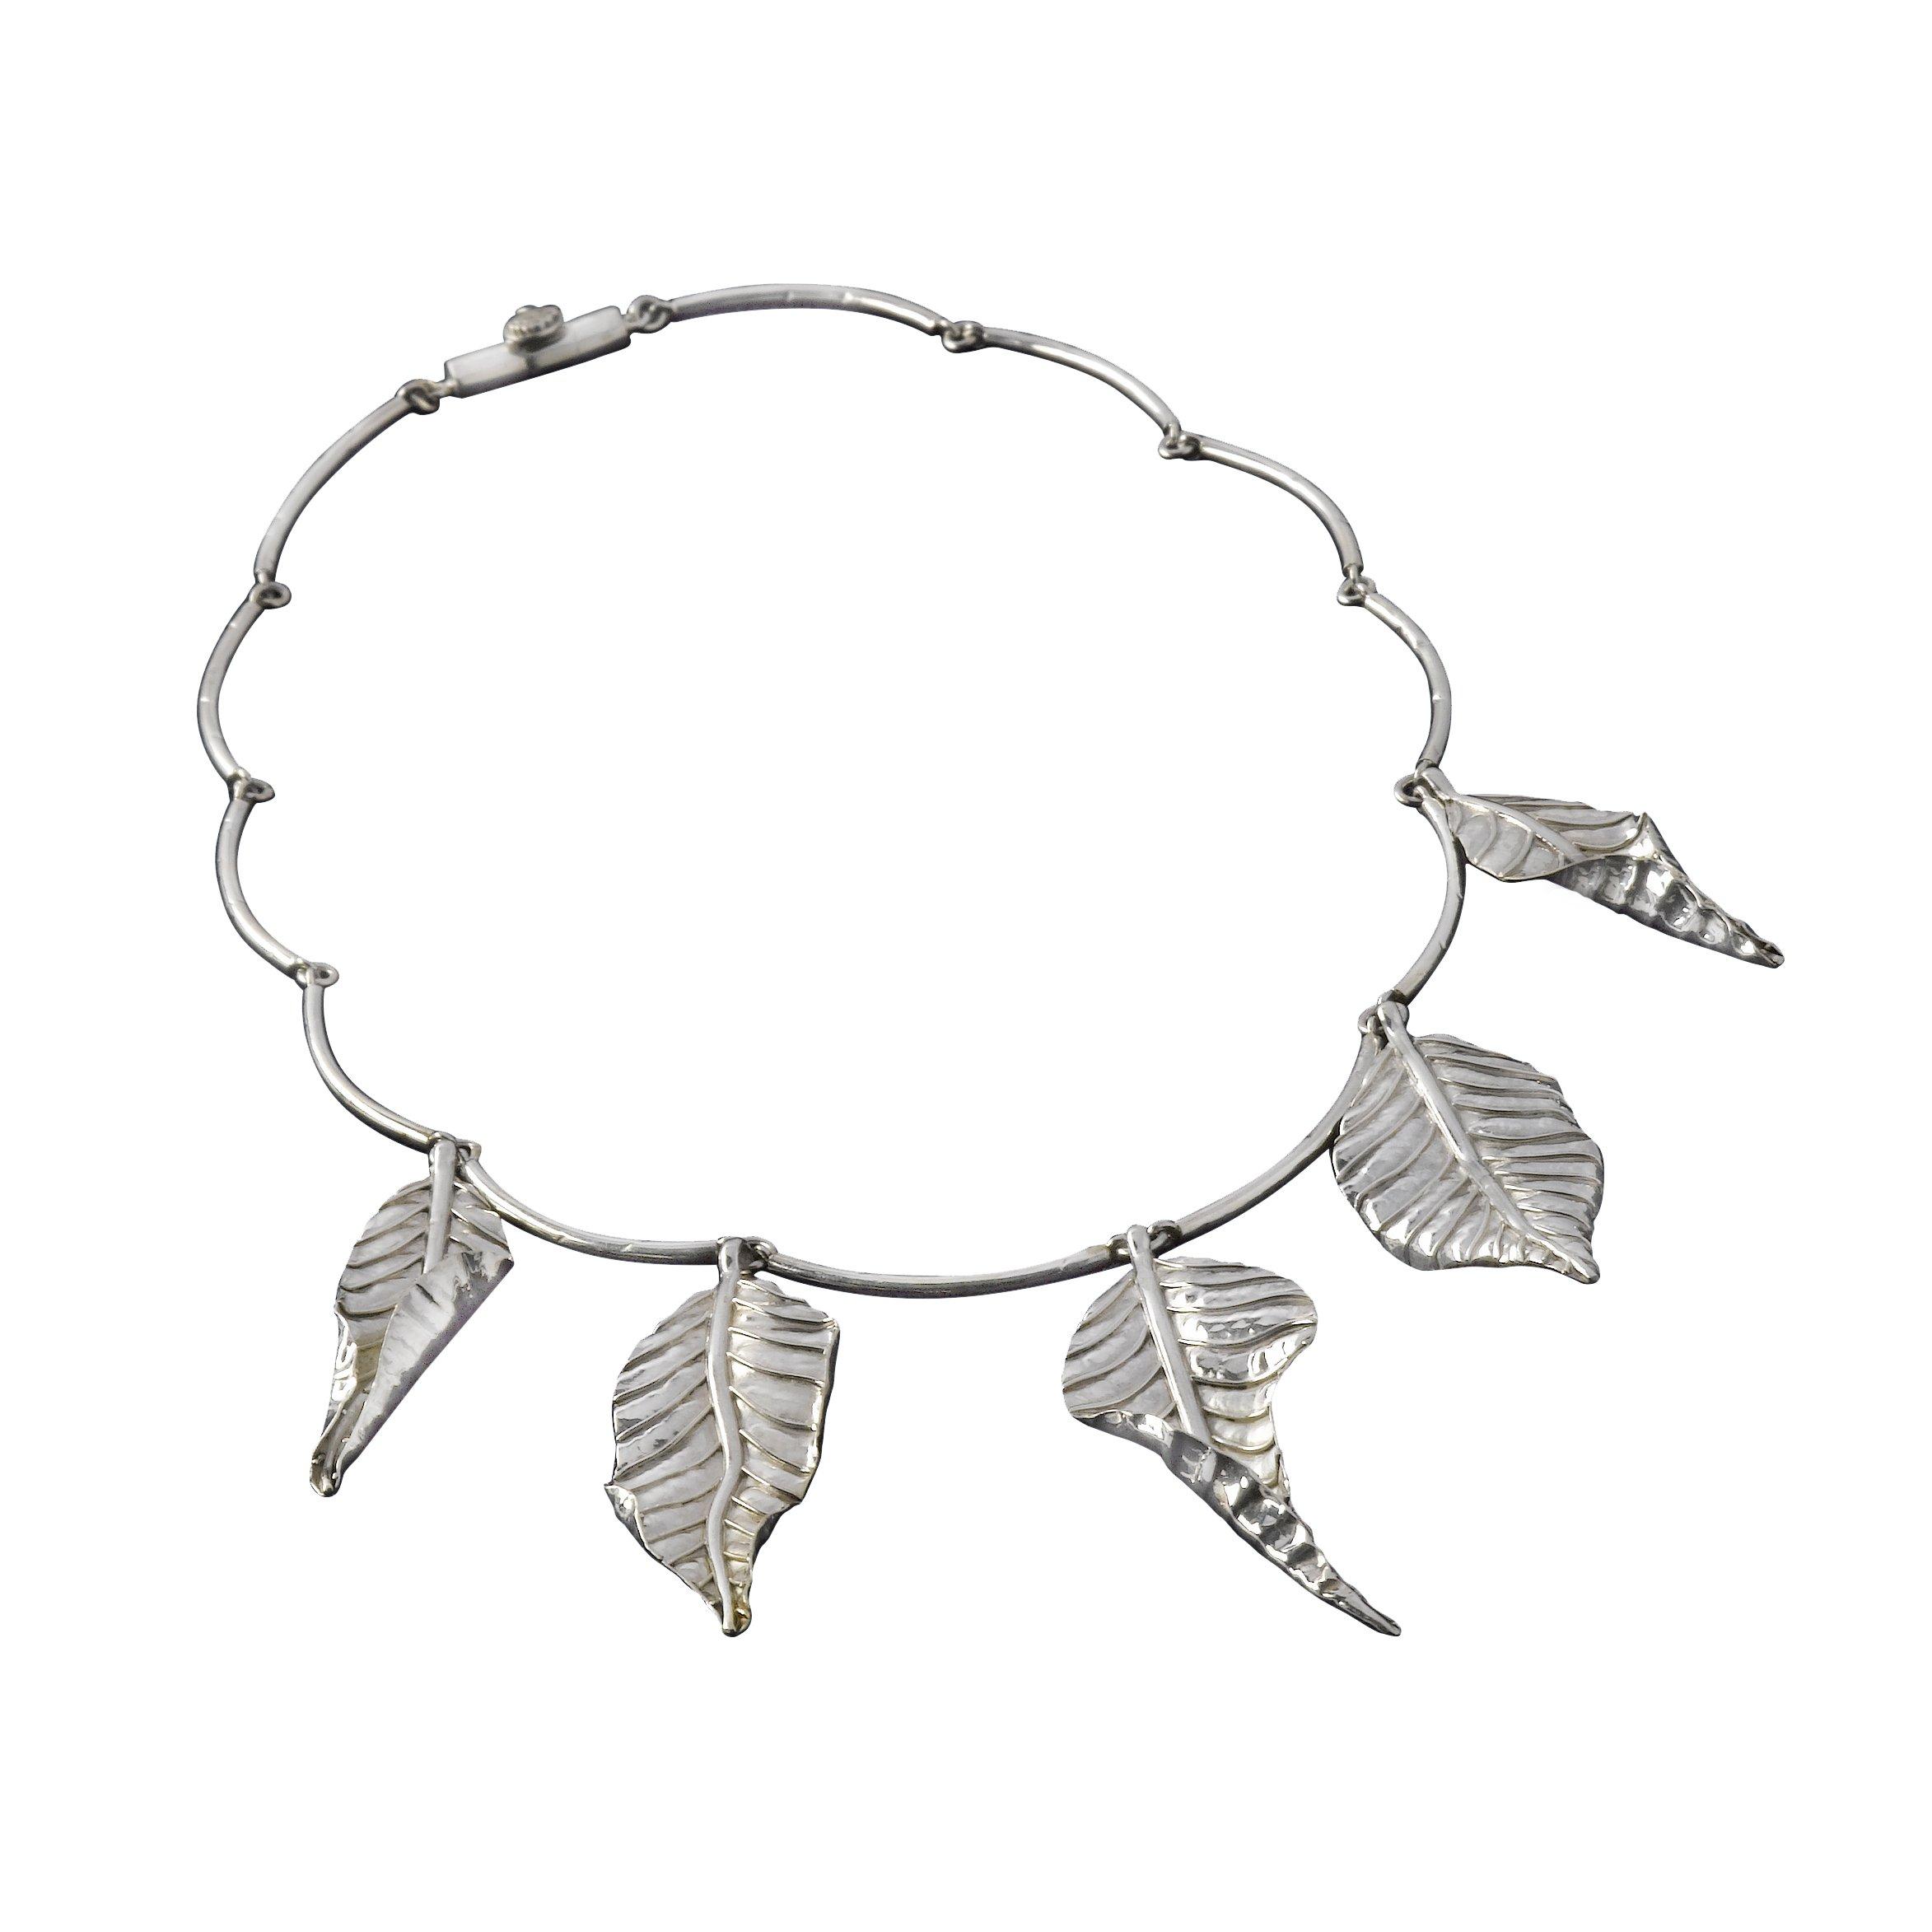 2346x2346 Autumn Laurel Leaf Necklace Tarra Rosenbaum Handmade Jewelry